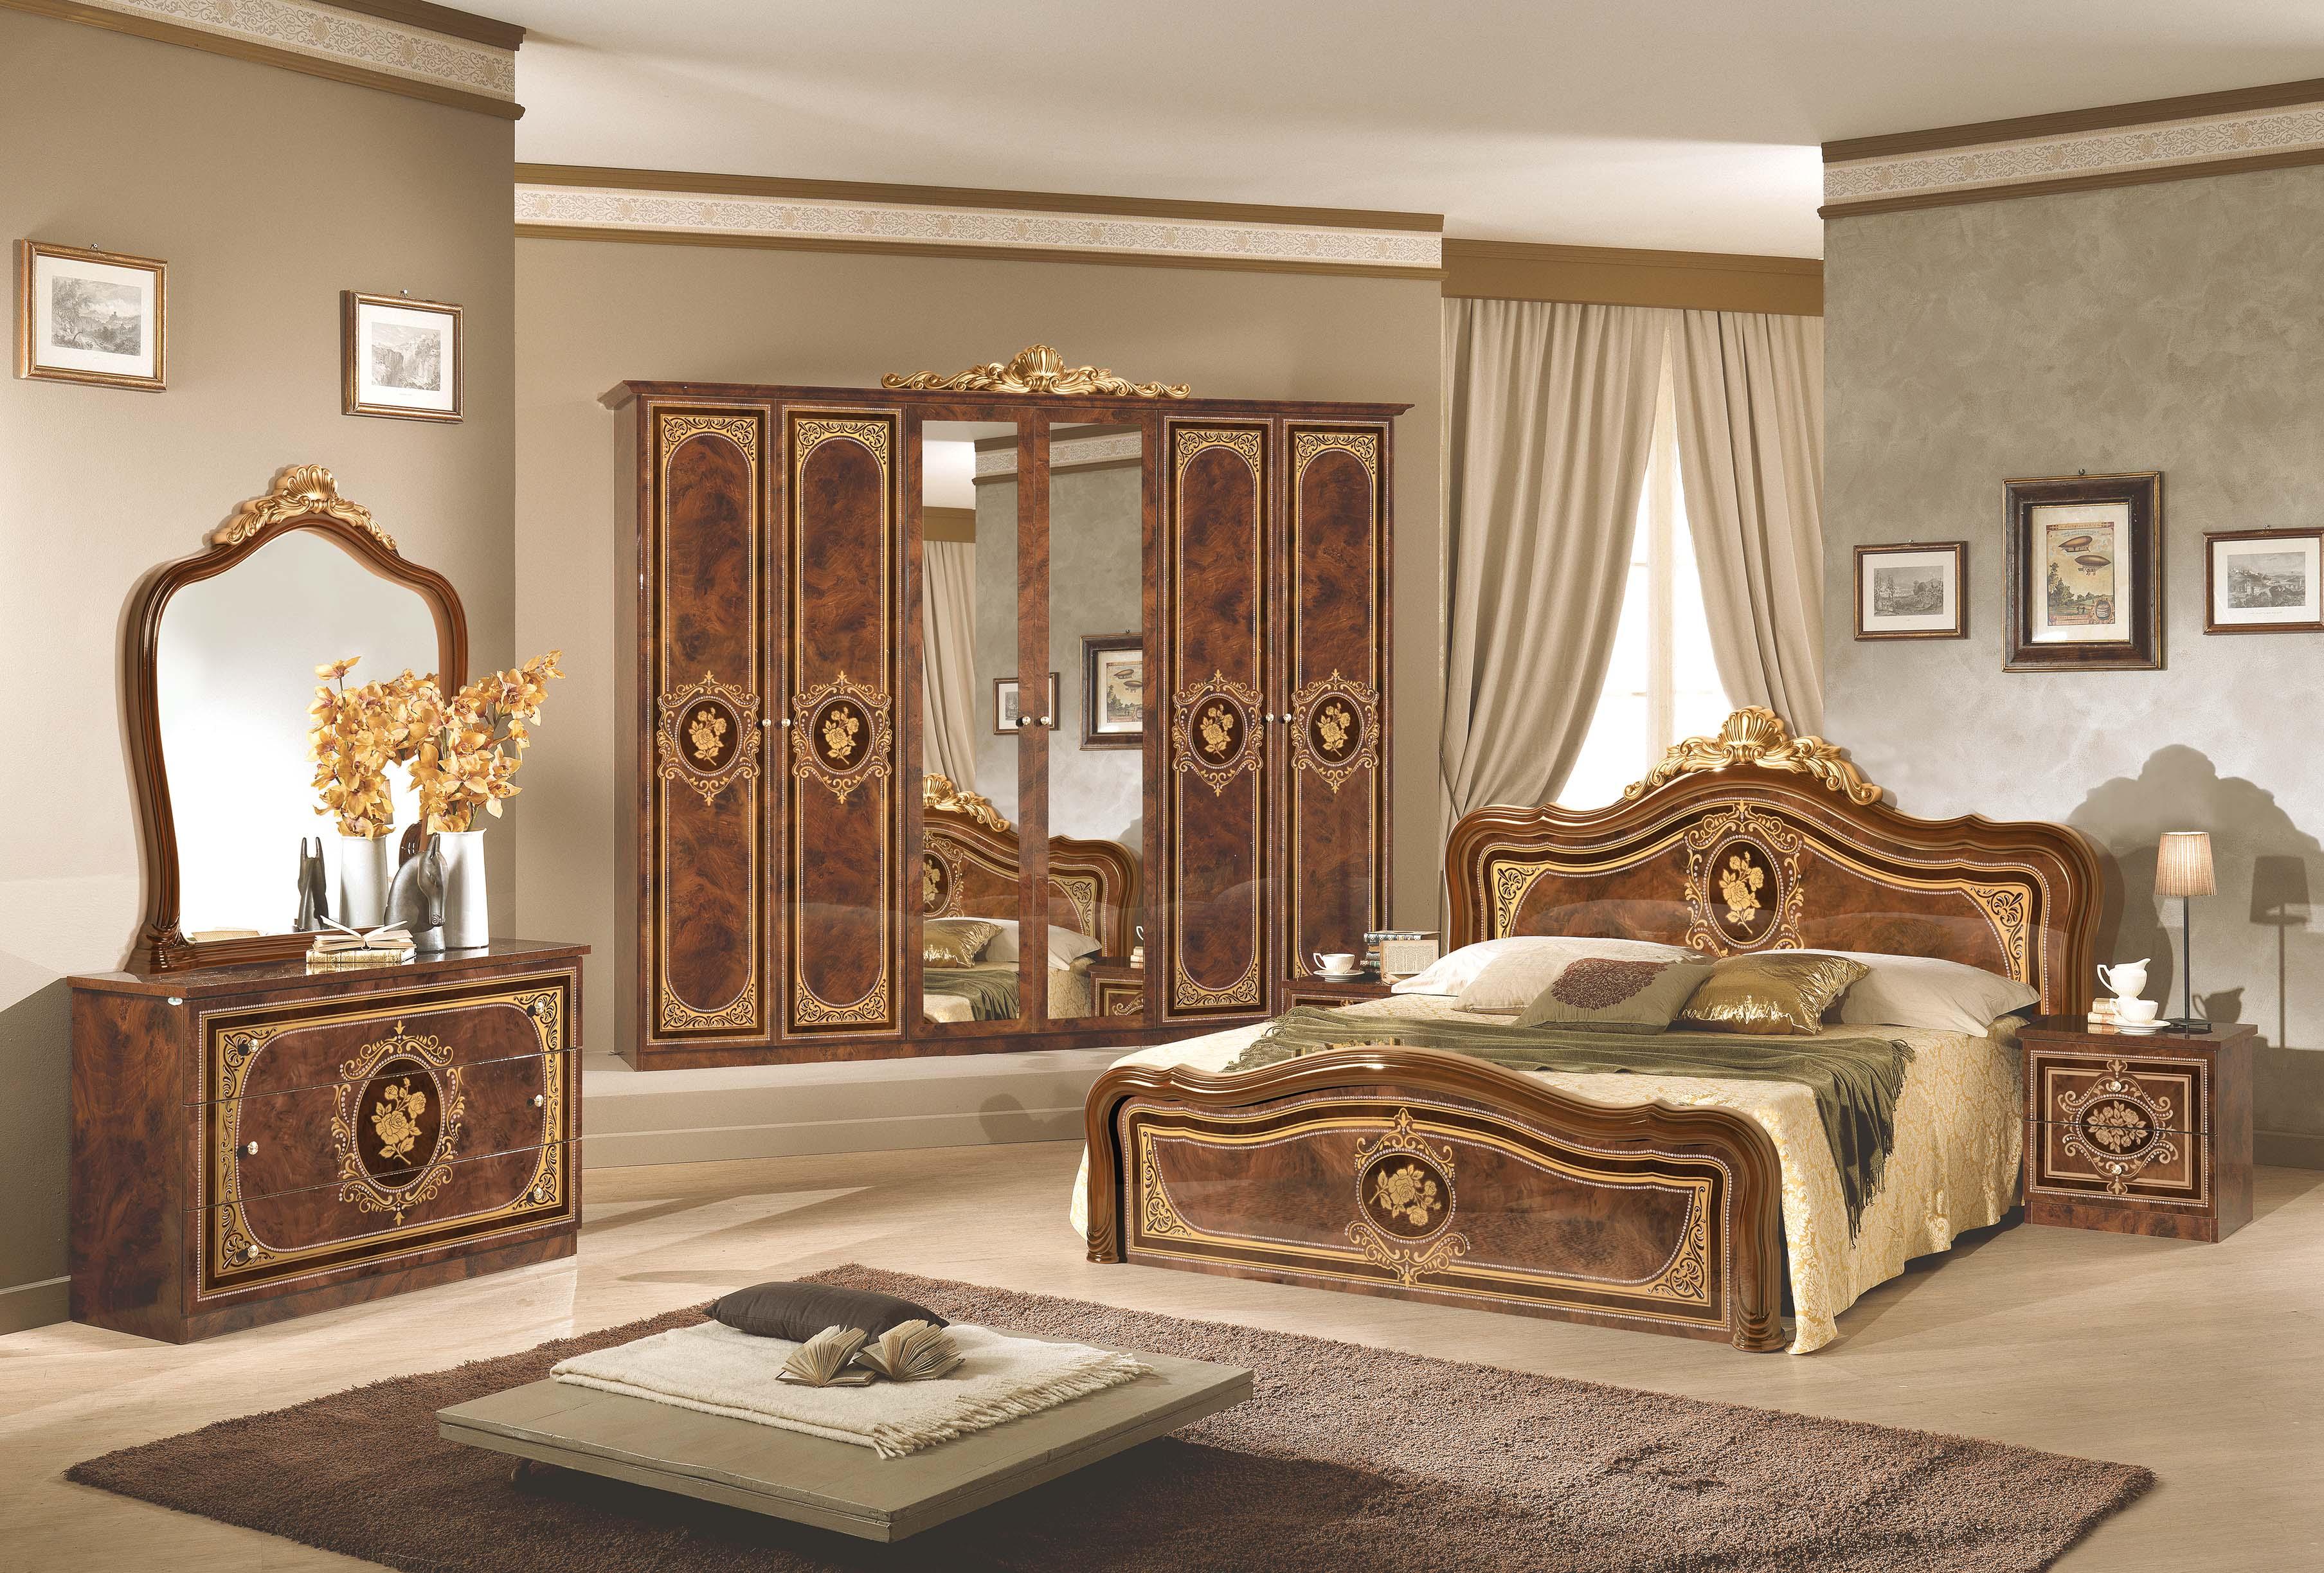 kommode mit spiegel alice in beige creme schlafzimmer xp pkalccom1spech. Black Bedroom Furniture Sets. Home Design Ideas